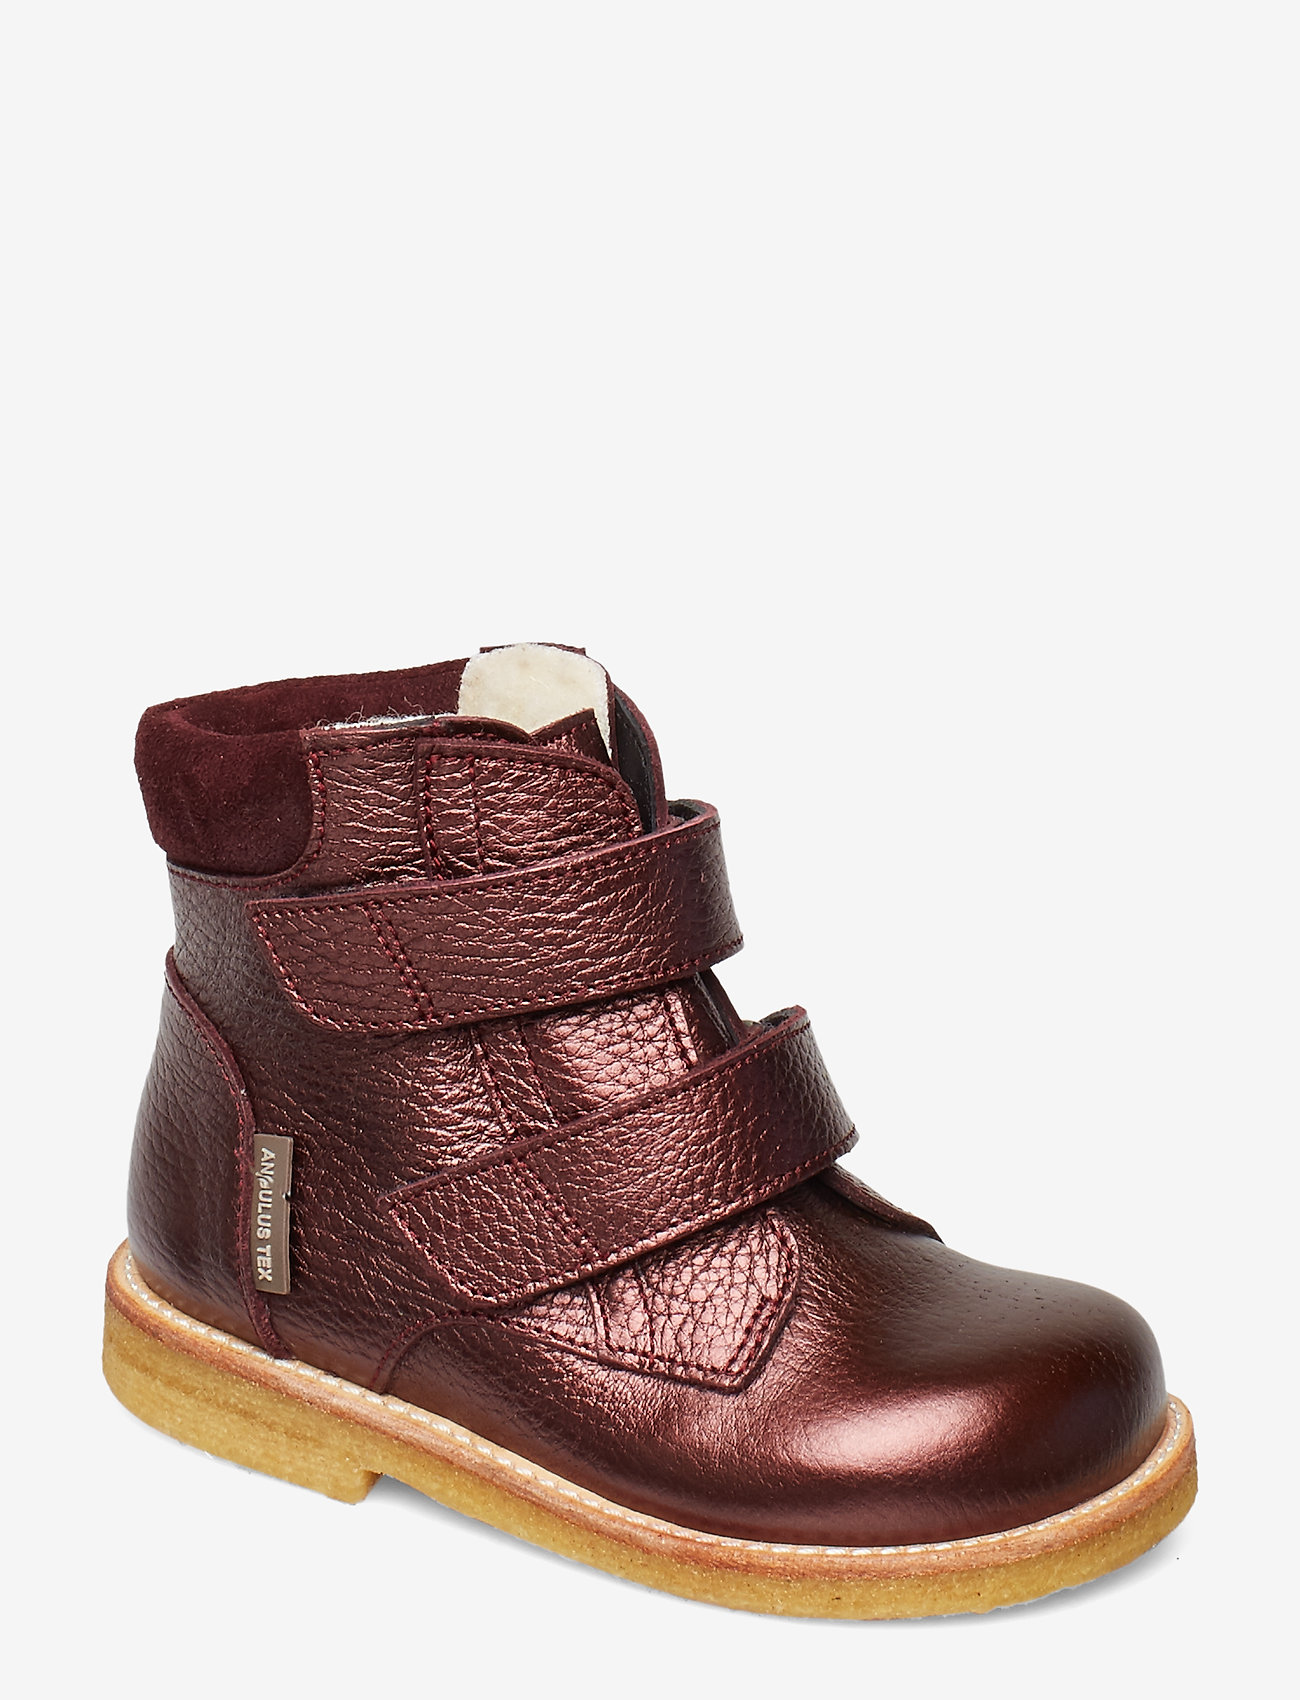 ANGULUS - Boots - flat - with velcro - lauflernschuhe - 1536/2195 bordeaux shine/b - 0